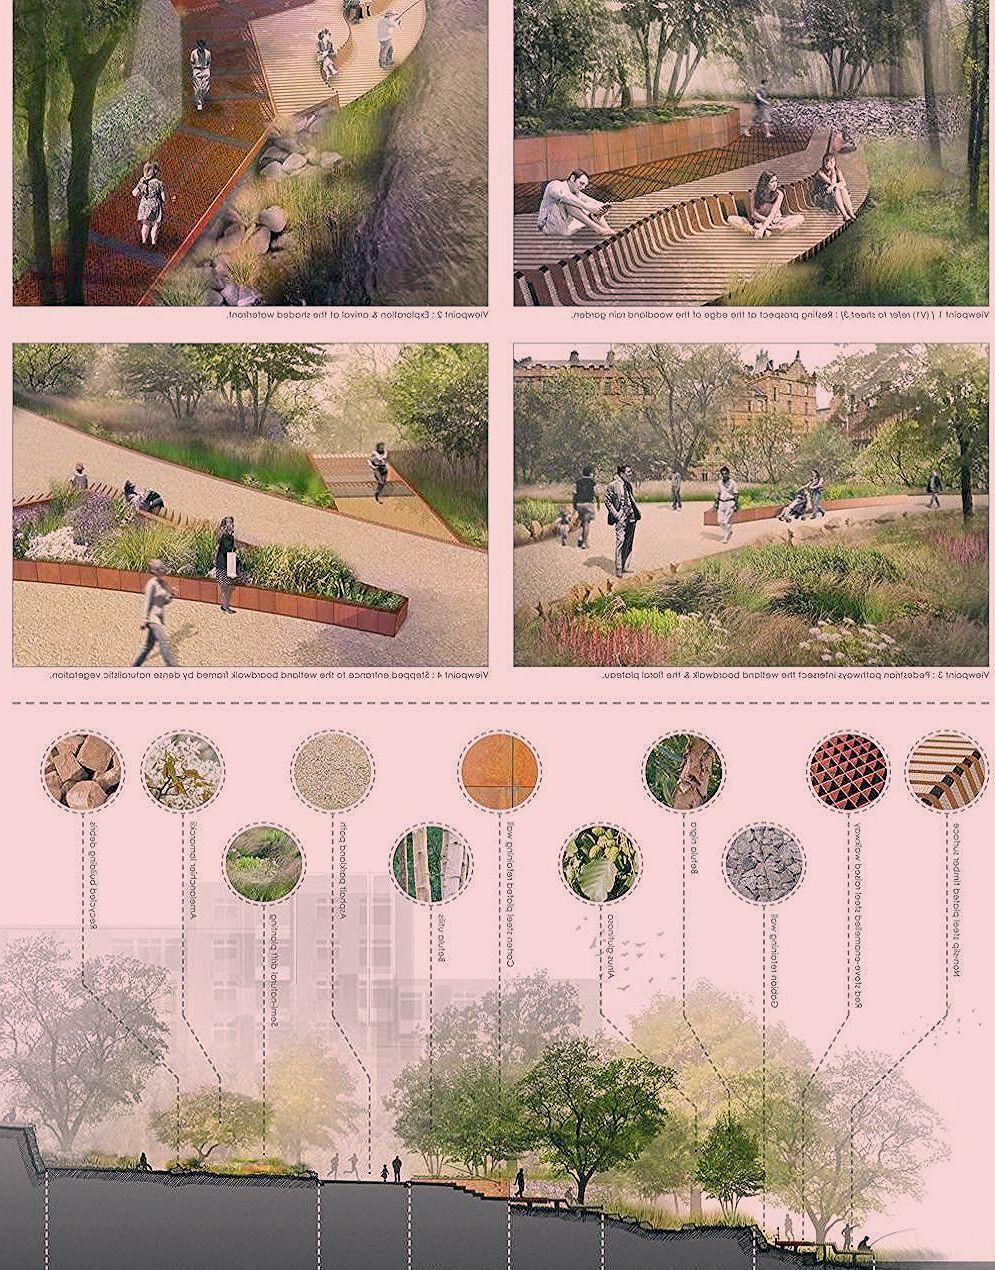 Landscape Gardening Course Birmingham That Landscape Gardening Courses Manchester Quite Poster Design Software Landscape Design Software Free Landscape Design